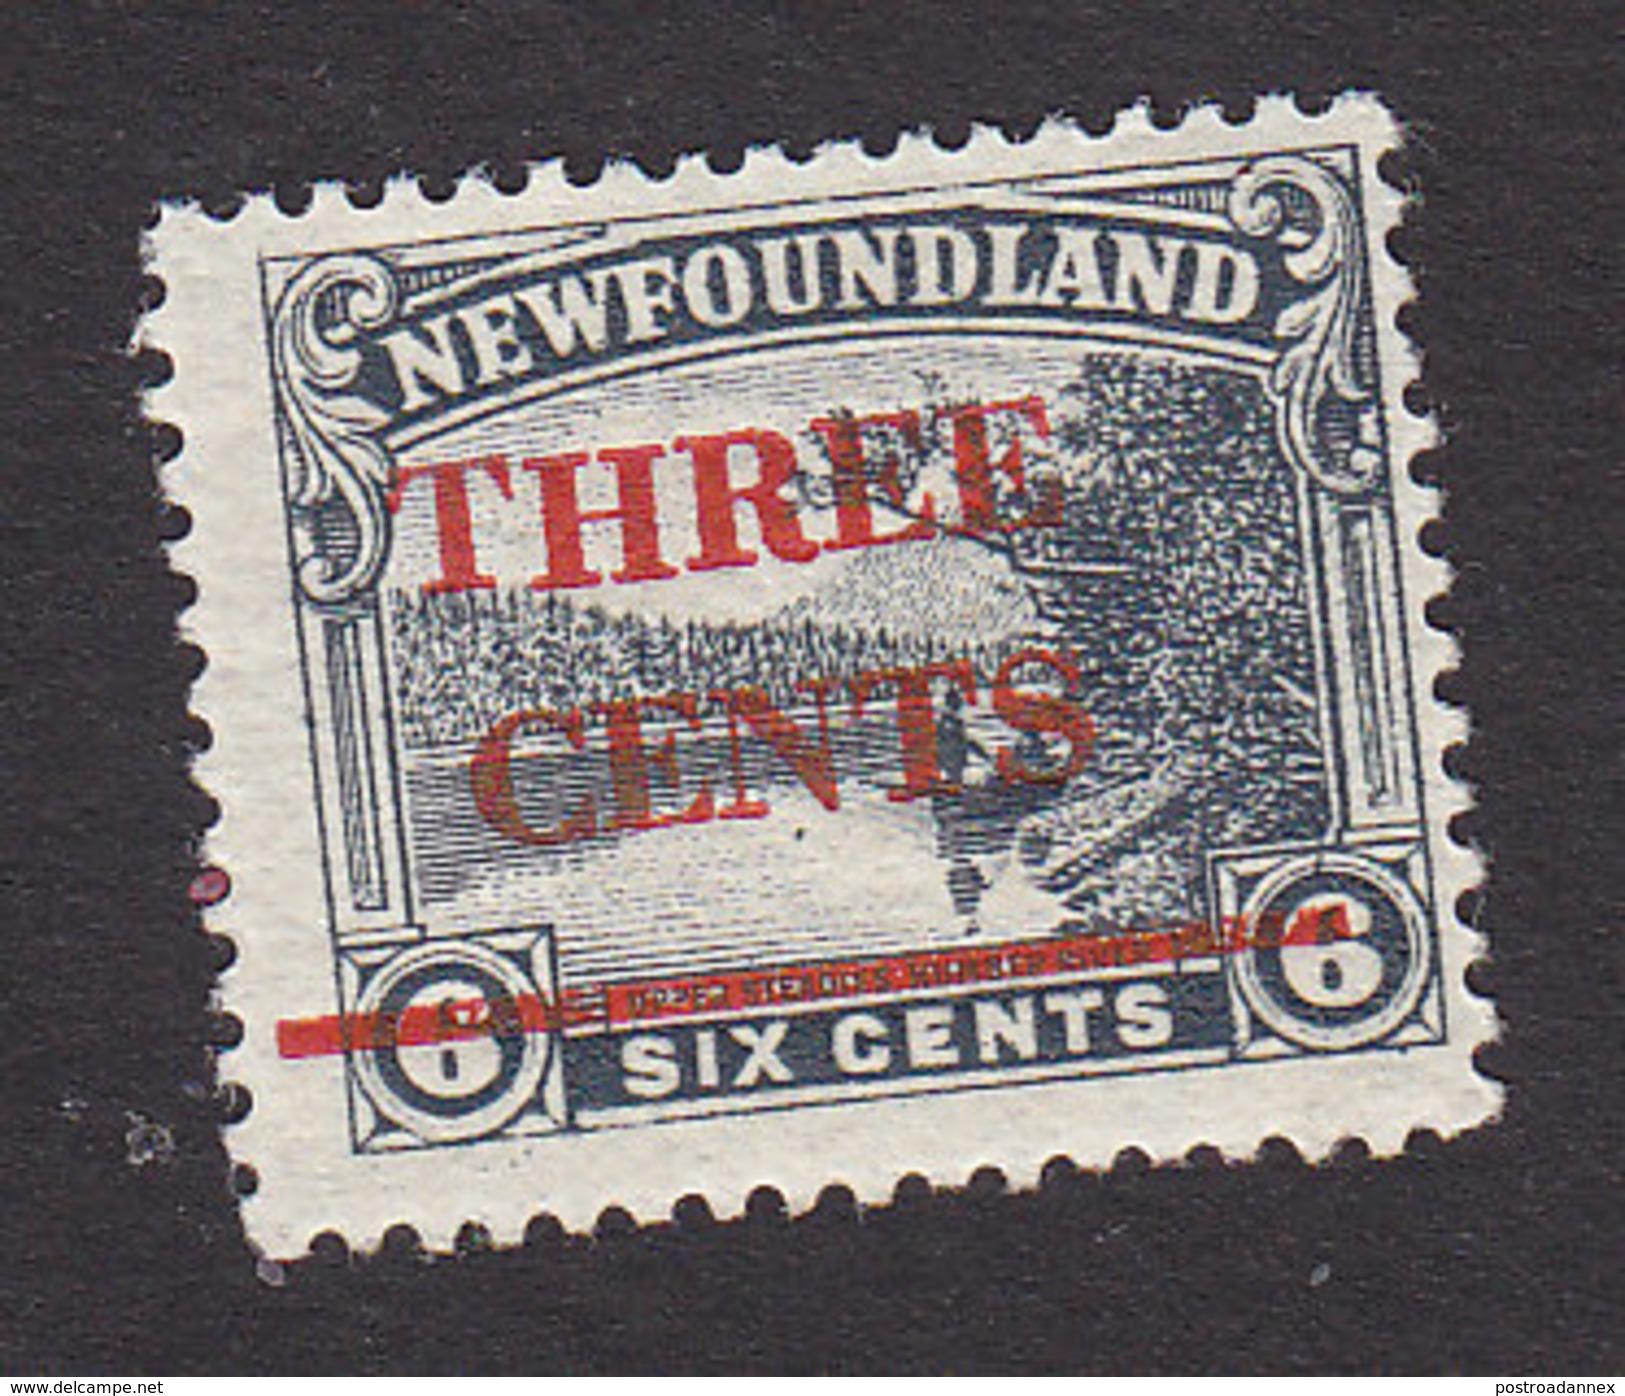 Newfoundland, Scott #160, Mint Hinged, Upper Steadies Surcharged, Issued 1929 - Terre-Neuve